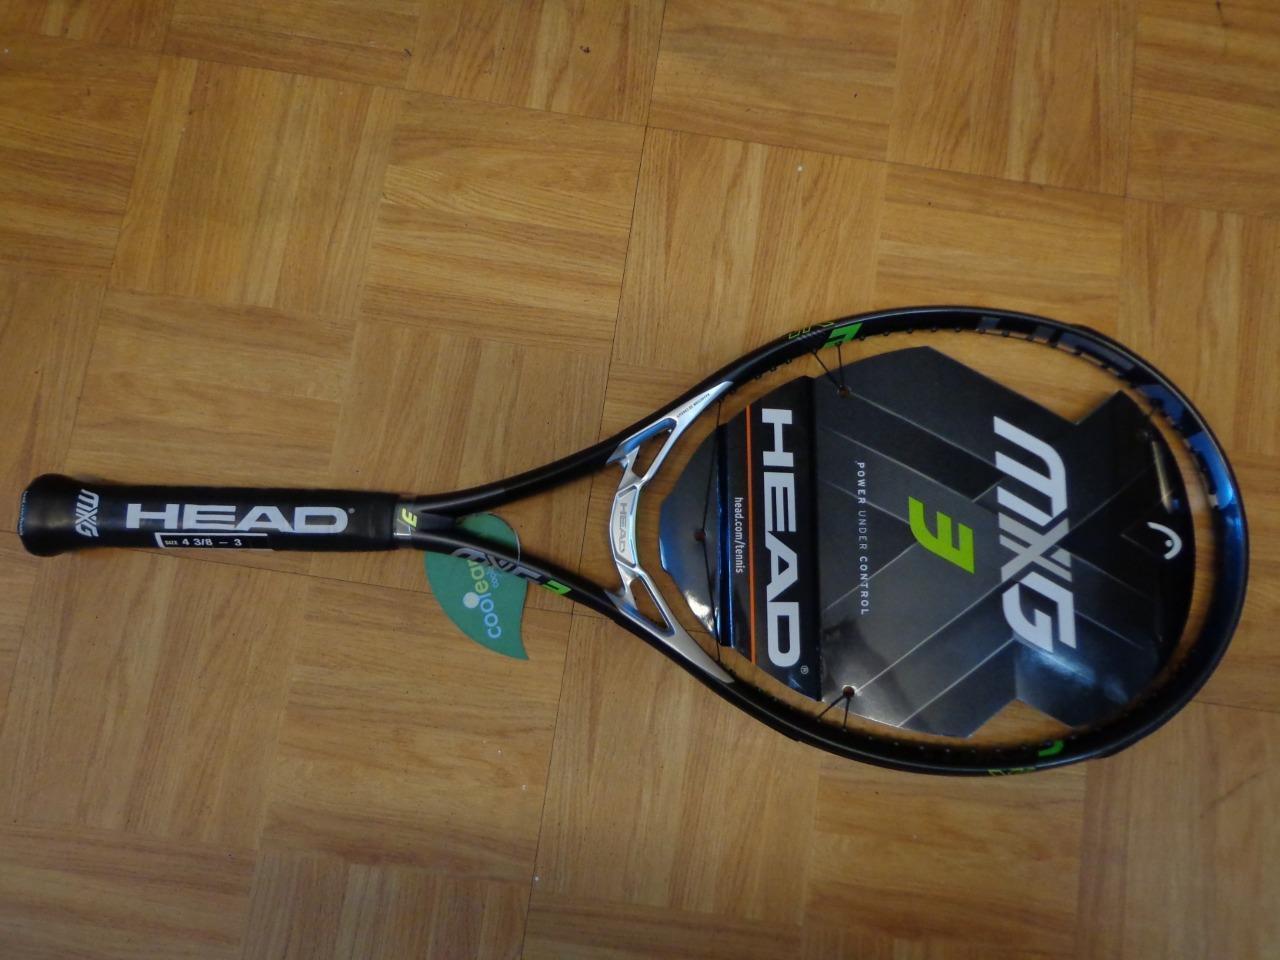 Nouveau 2017 Head MXG 3 midplus 100 Head 16x18 10.4 OZ (environ 294.83 g) 4 3 8 grip raquette de tennis